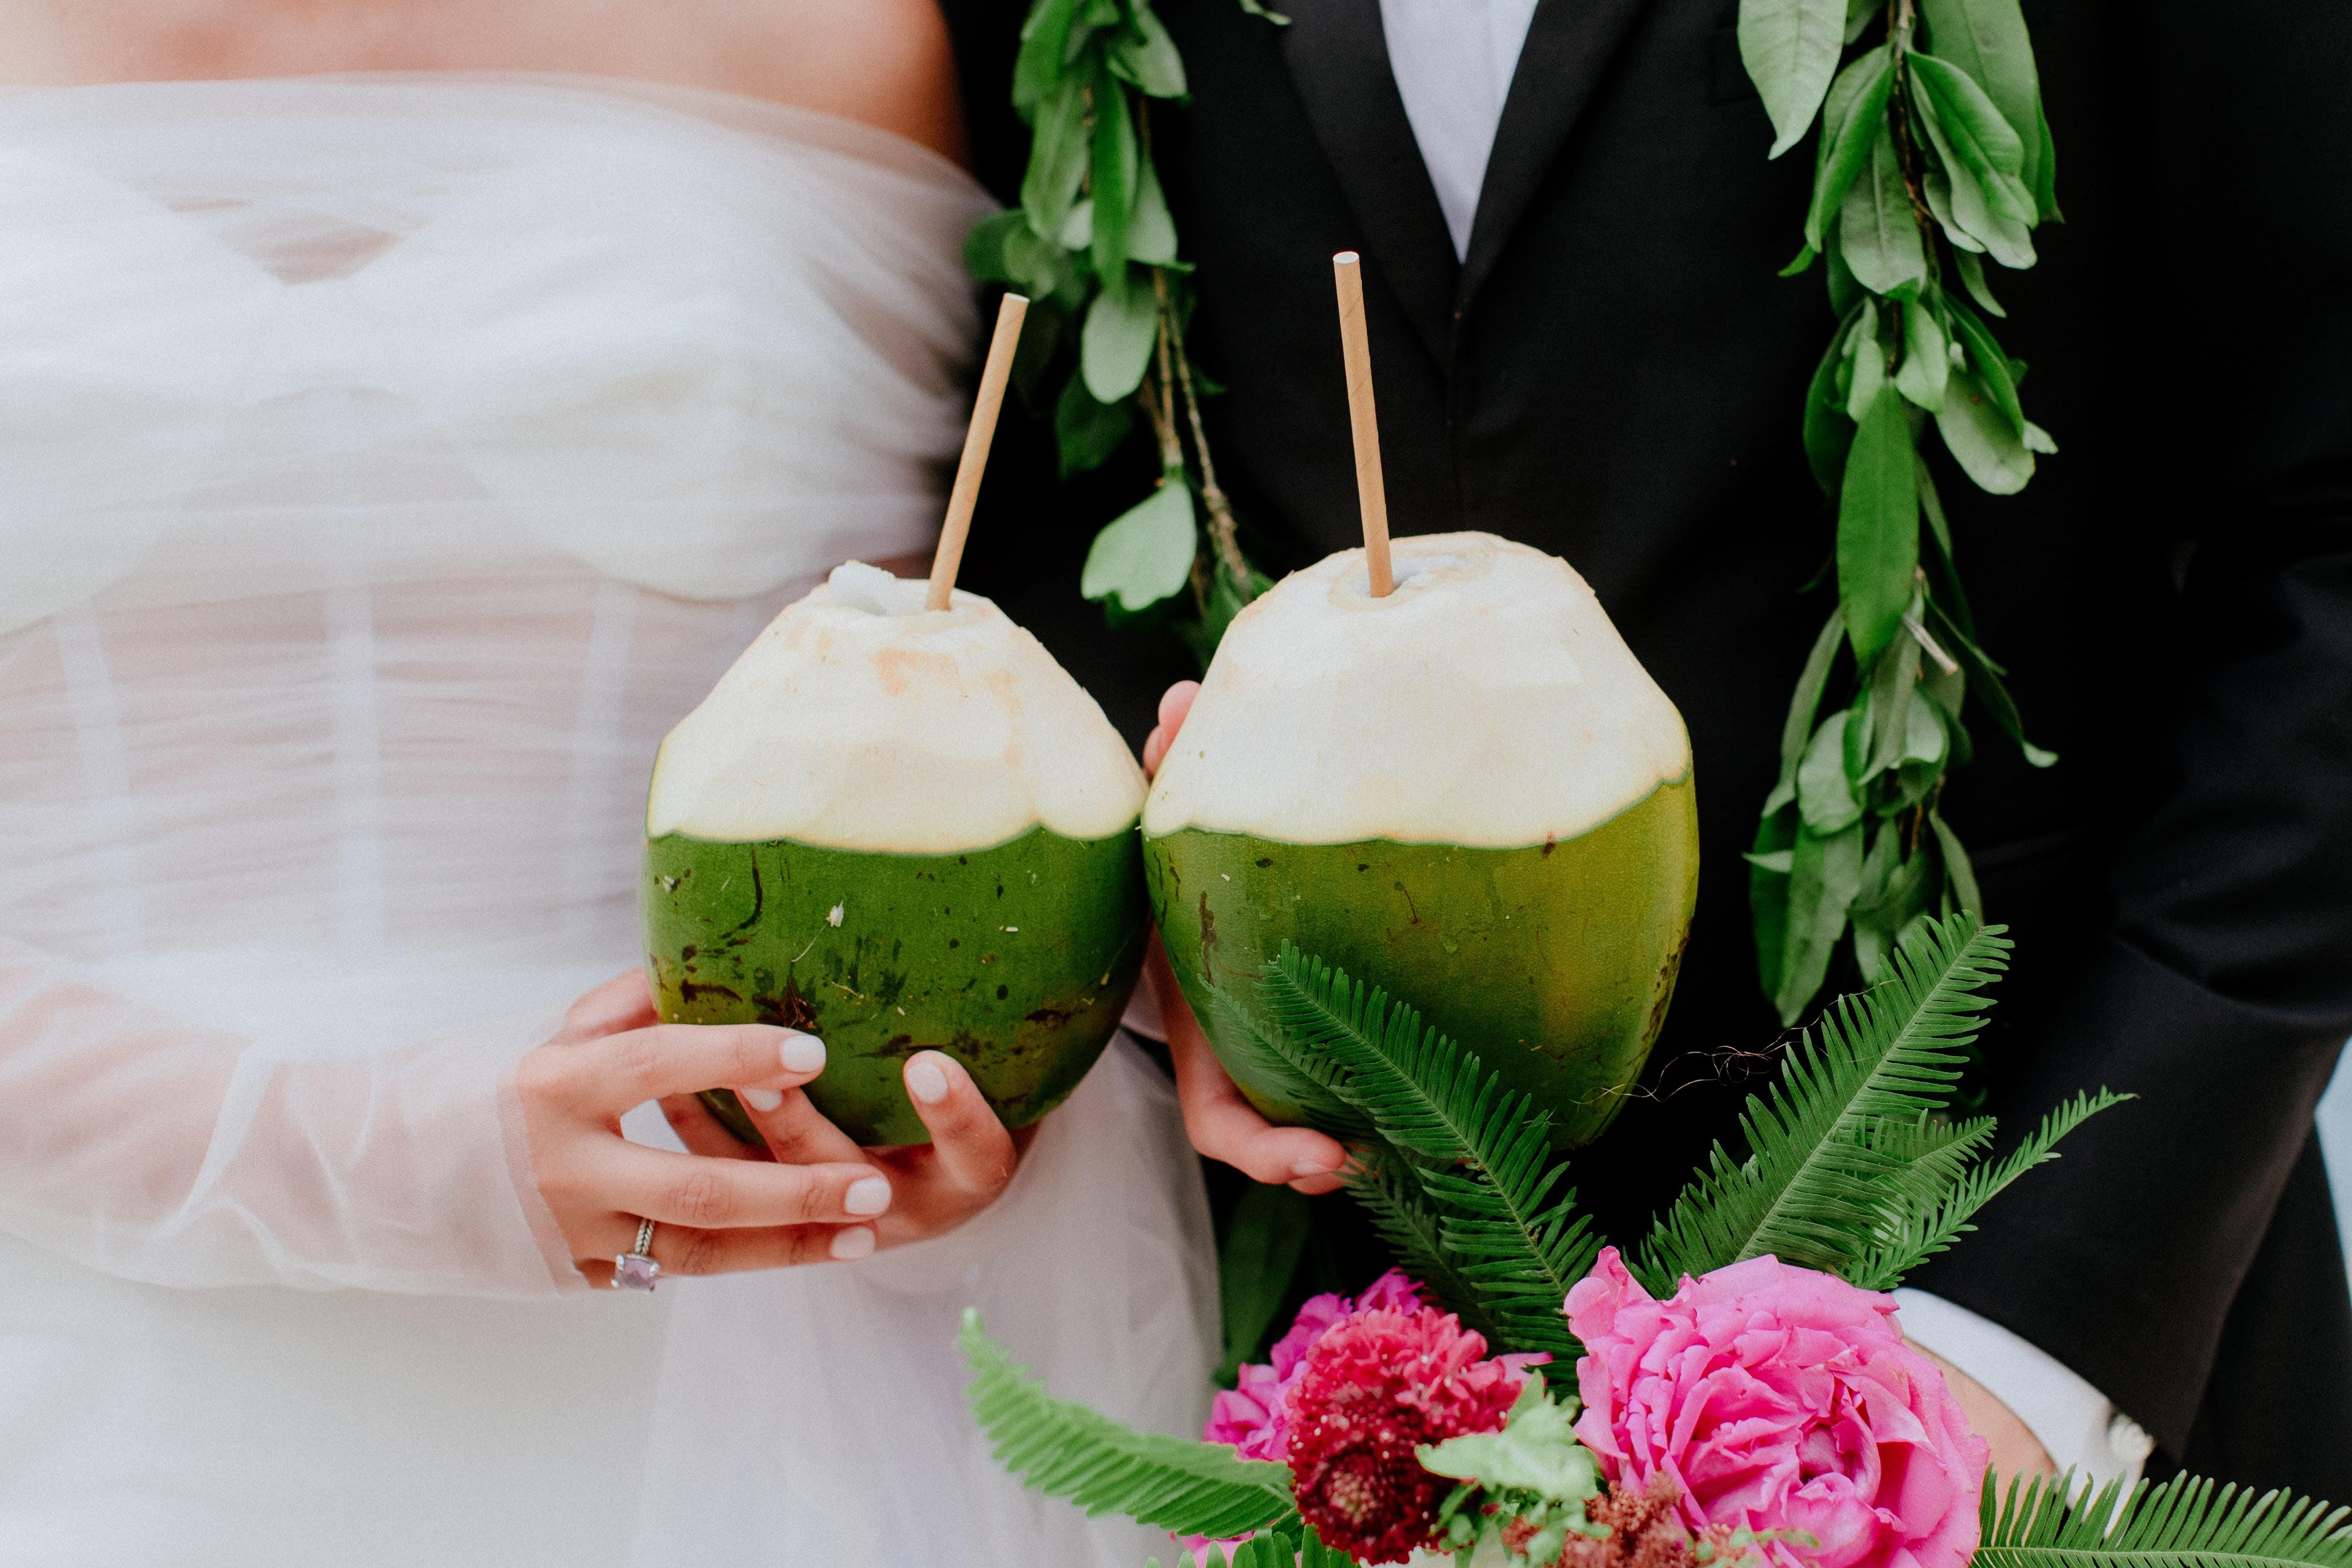 Maui custom coconuts